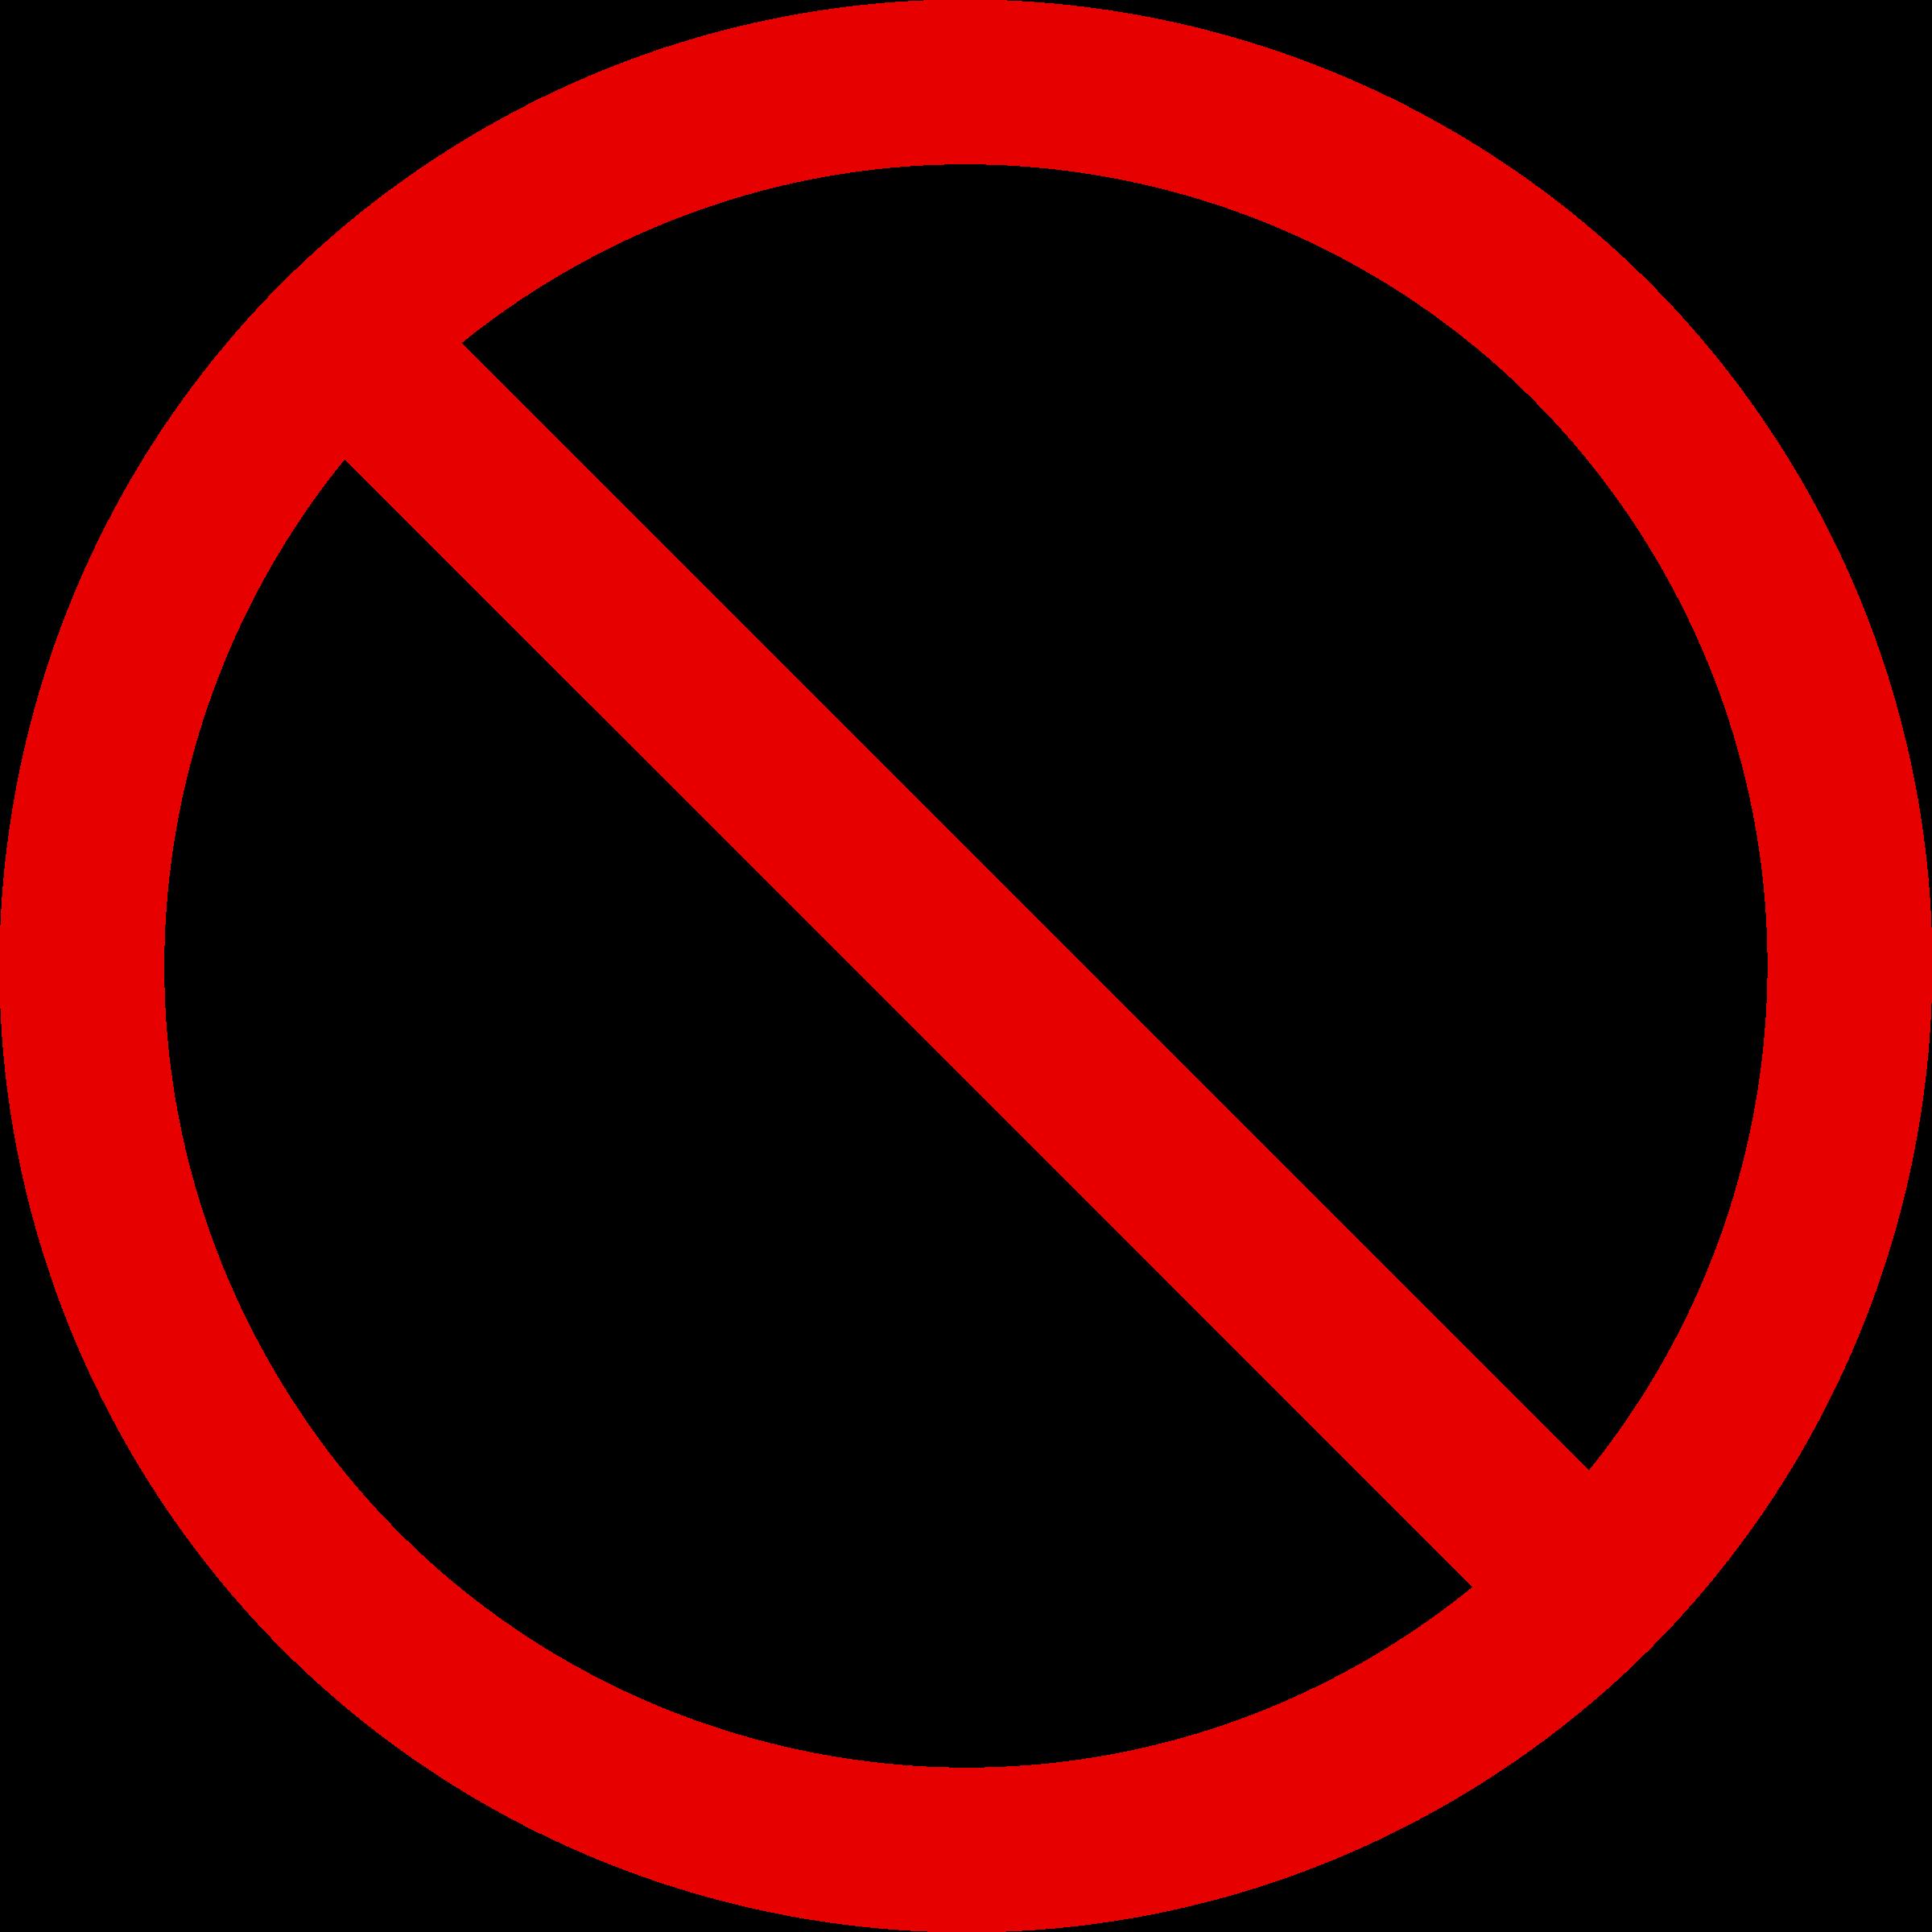 Drugs clipart sign. No smoking big image